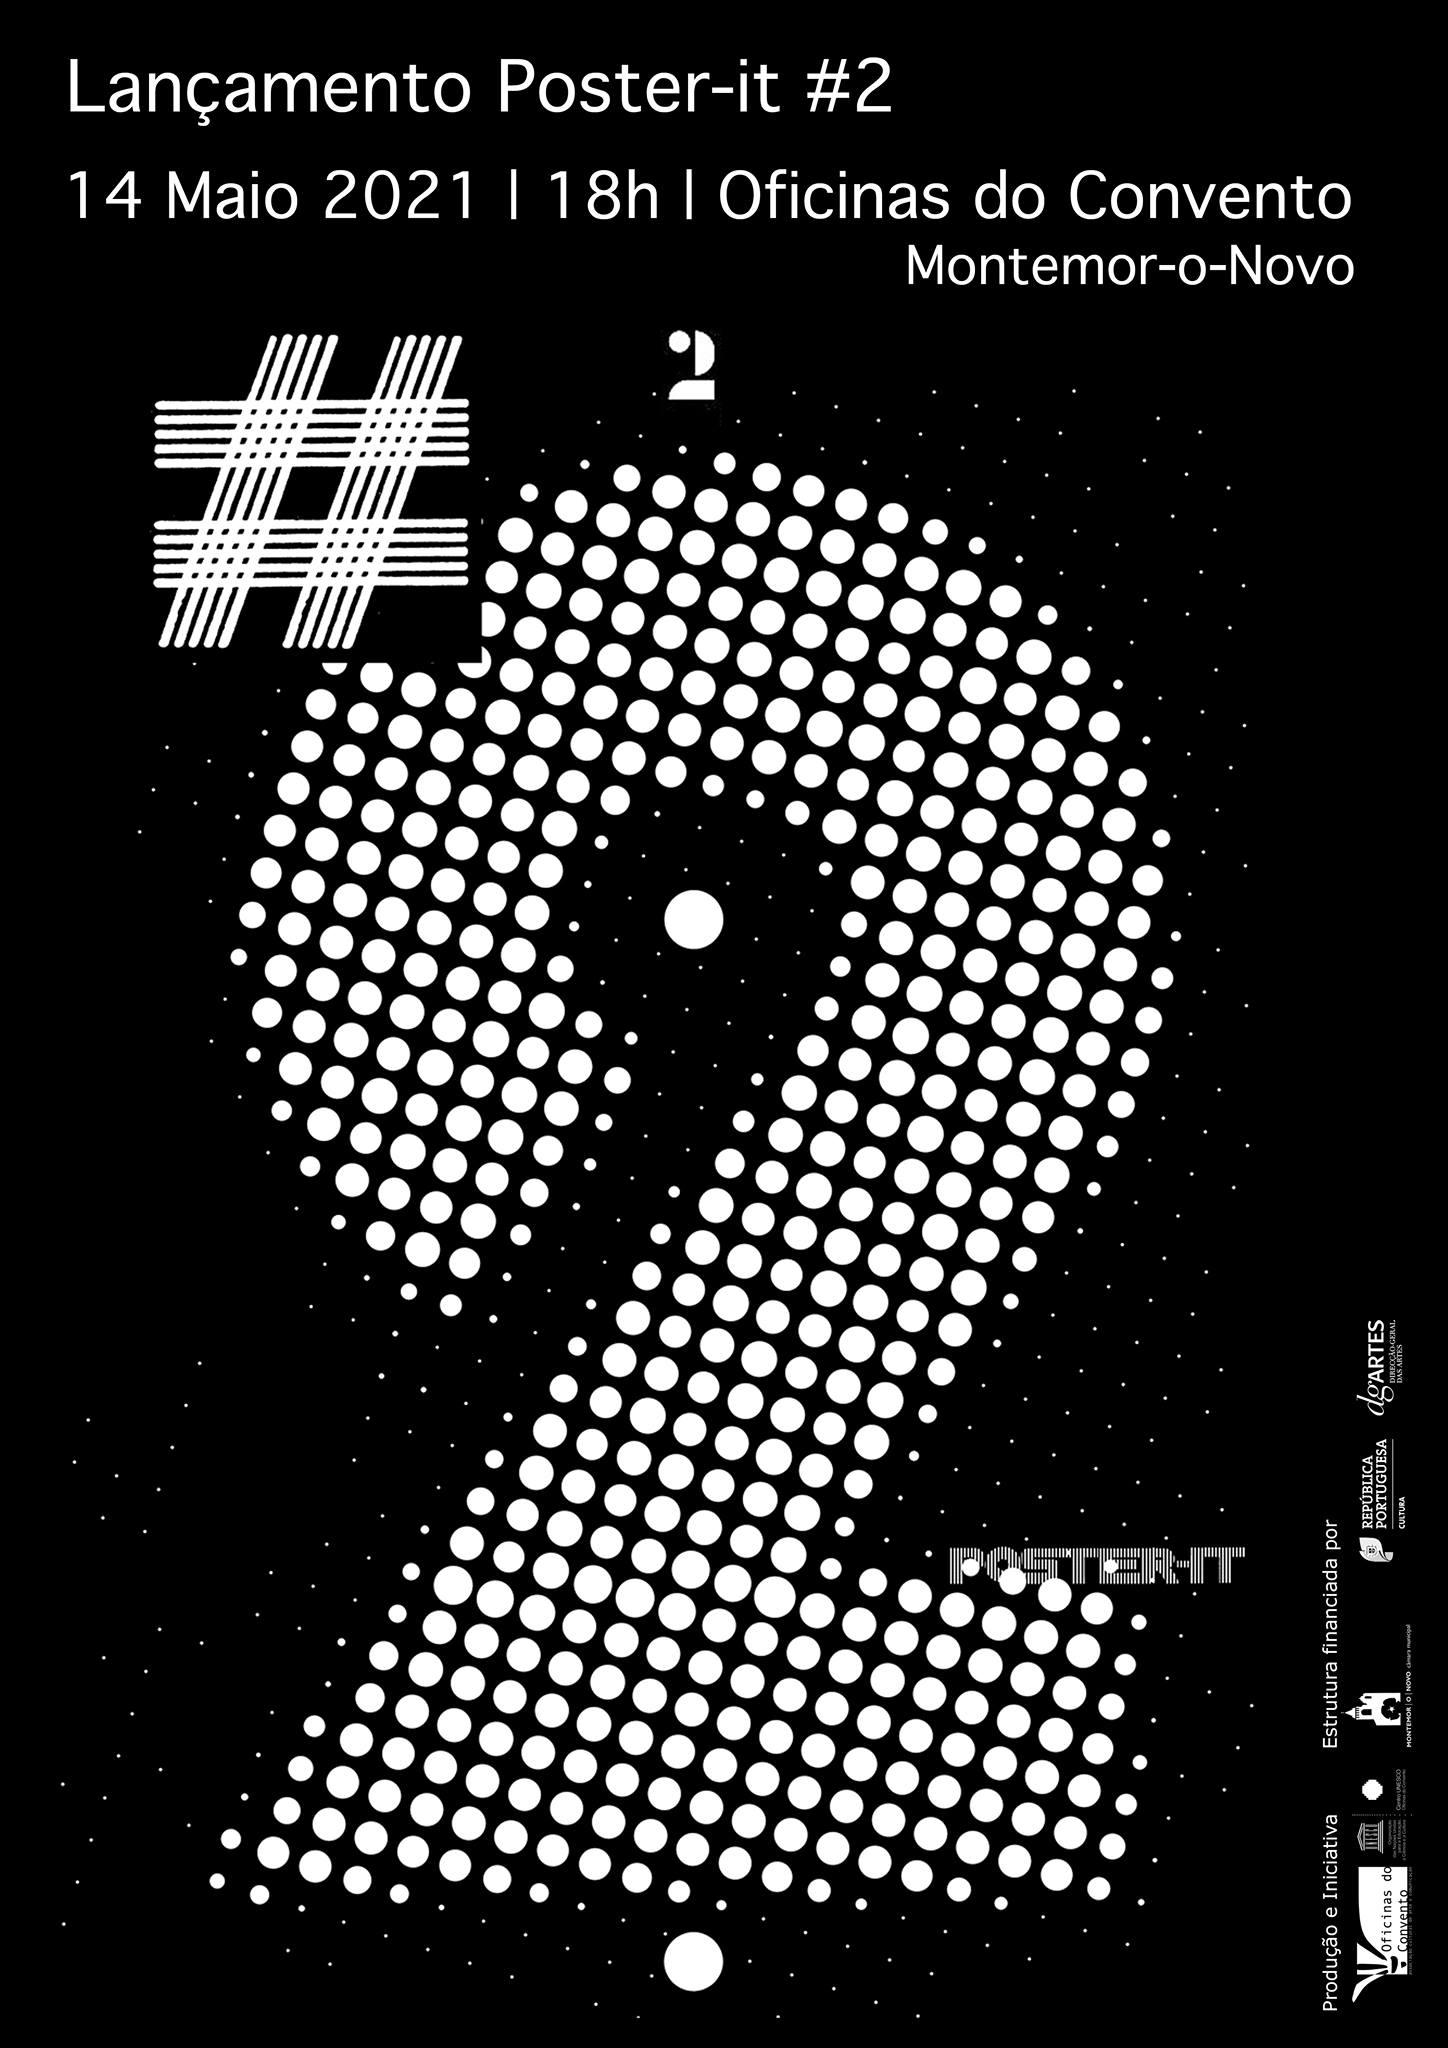 Lançamento Poster-it #2